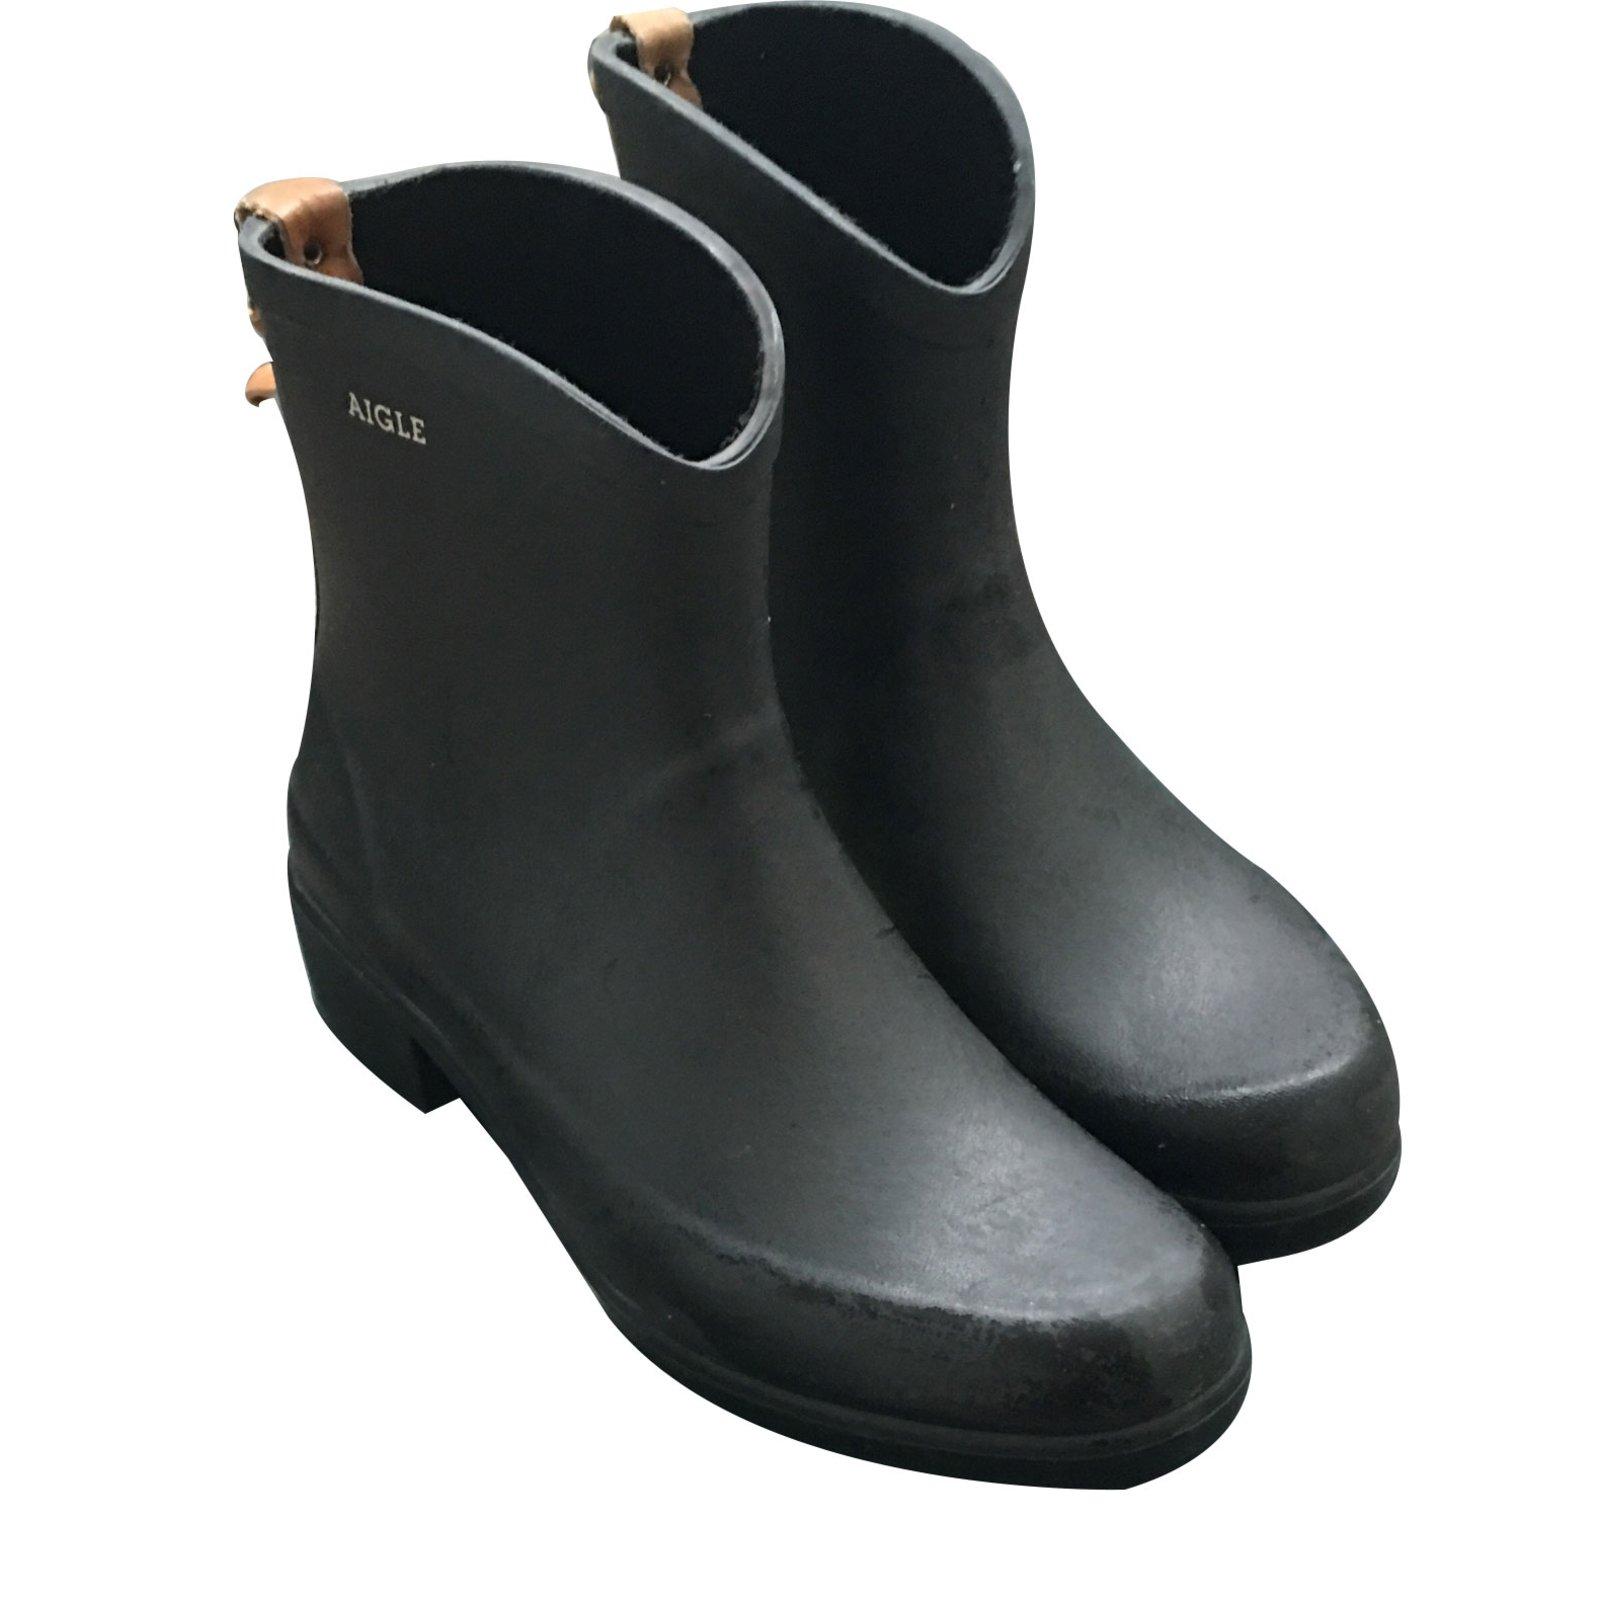 59bd09f37 Aigle Ankle Boots Ankle Boots Rubber Black ref.18263 - Joli Closet